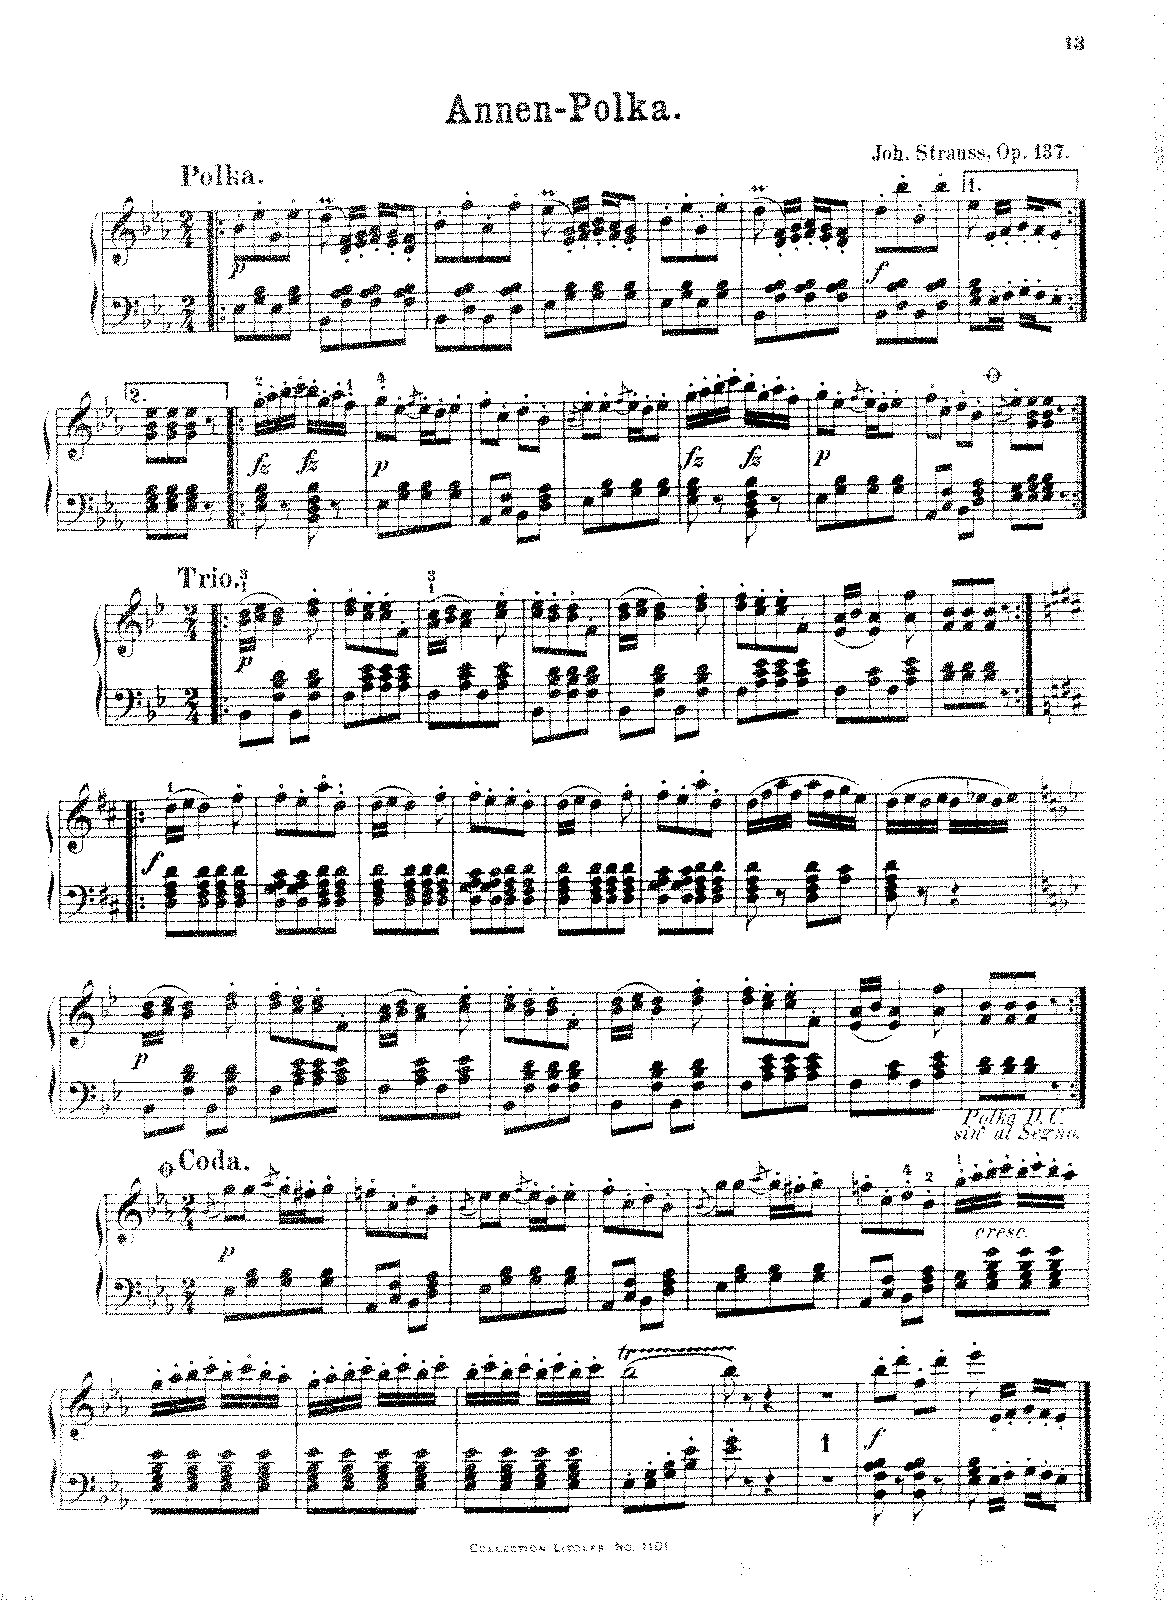 annen polka op strauss sr johann petrucci music for piano solo gorner